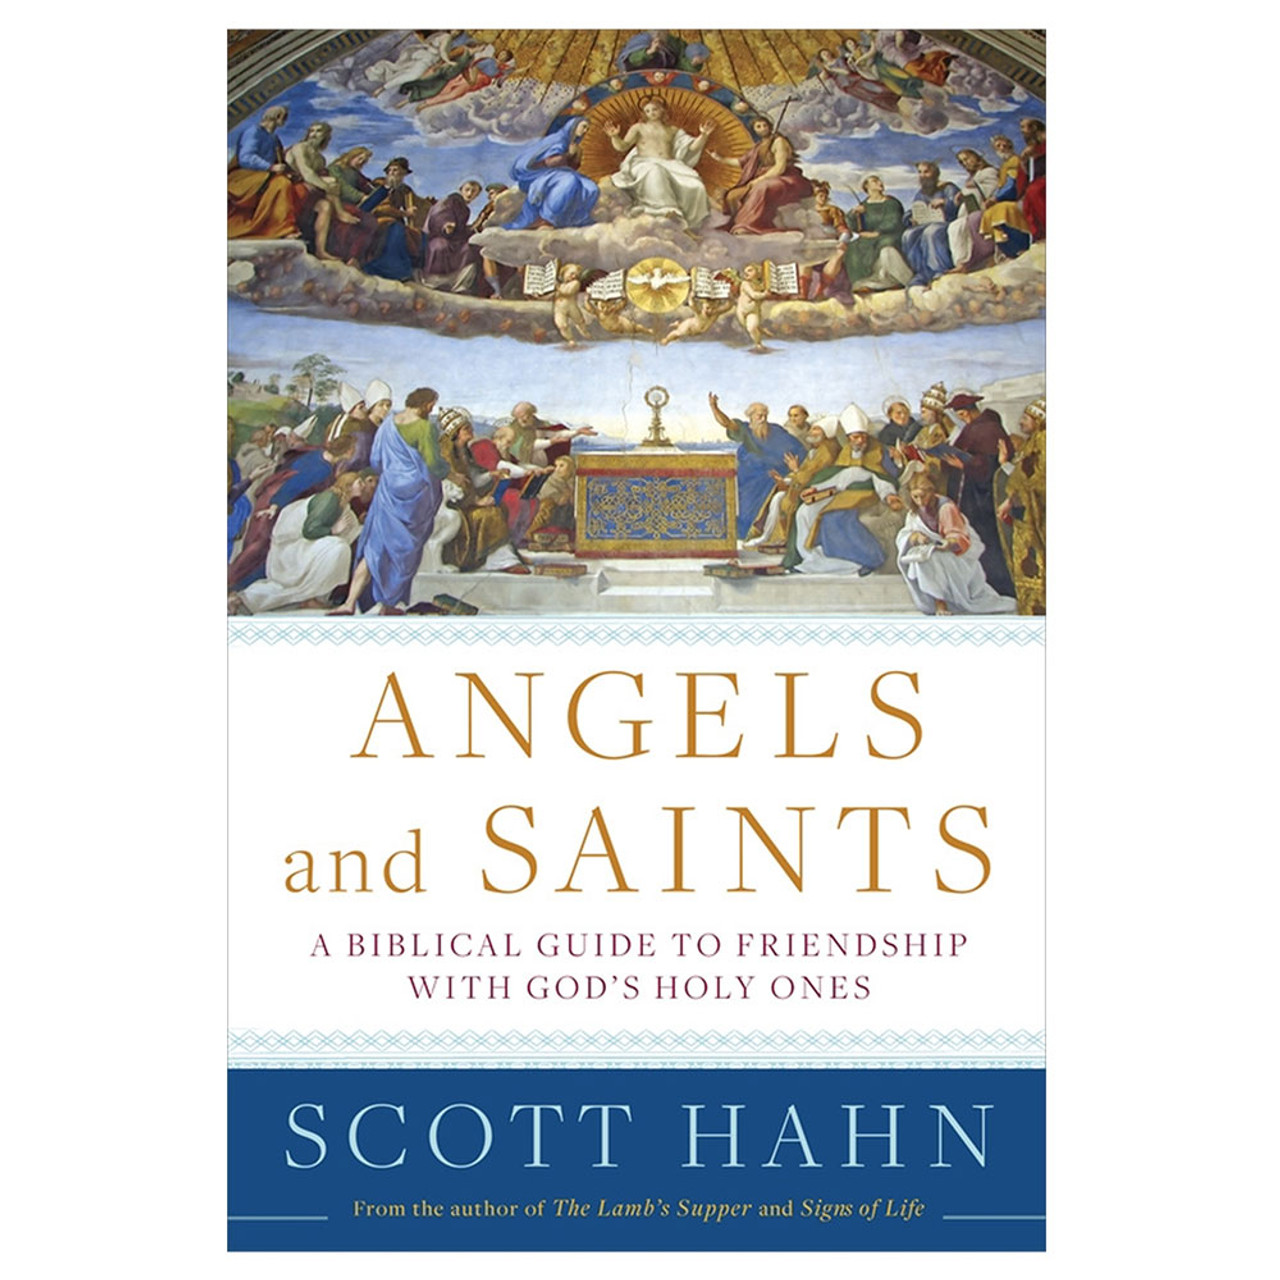 Angels and Saints Hahn, Scott